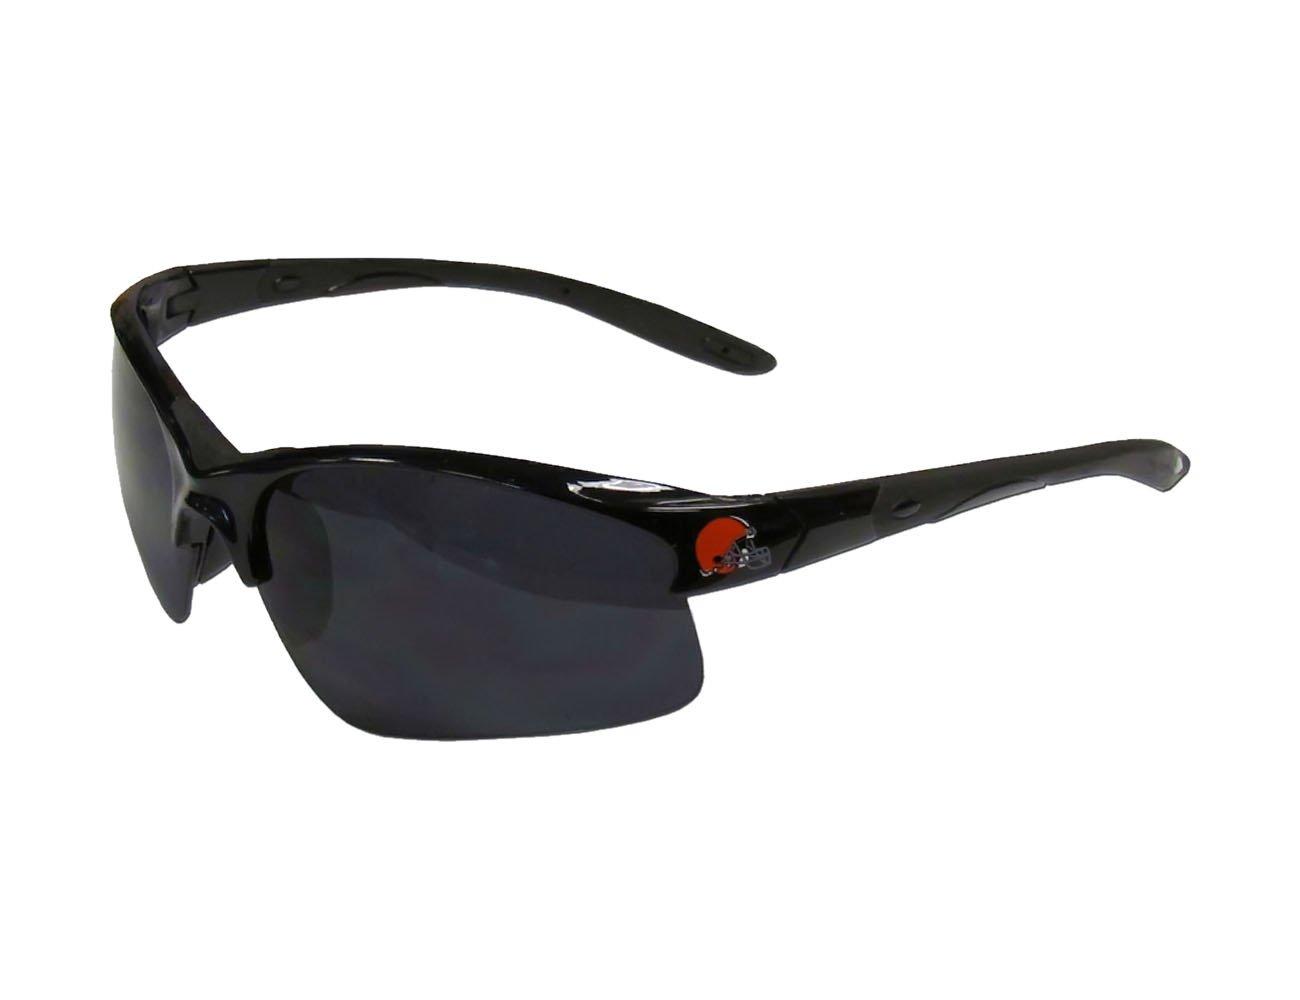 Siskiyou NFL Blade Sunglasses